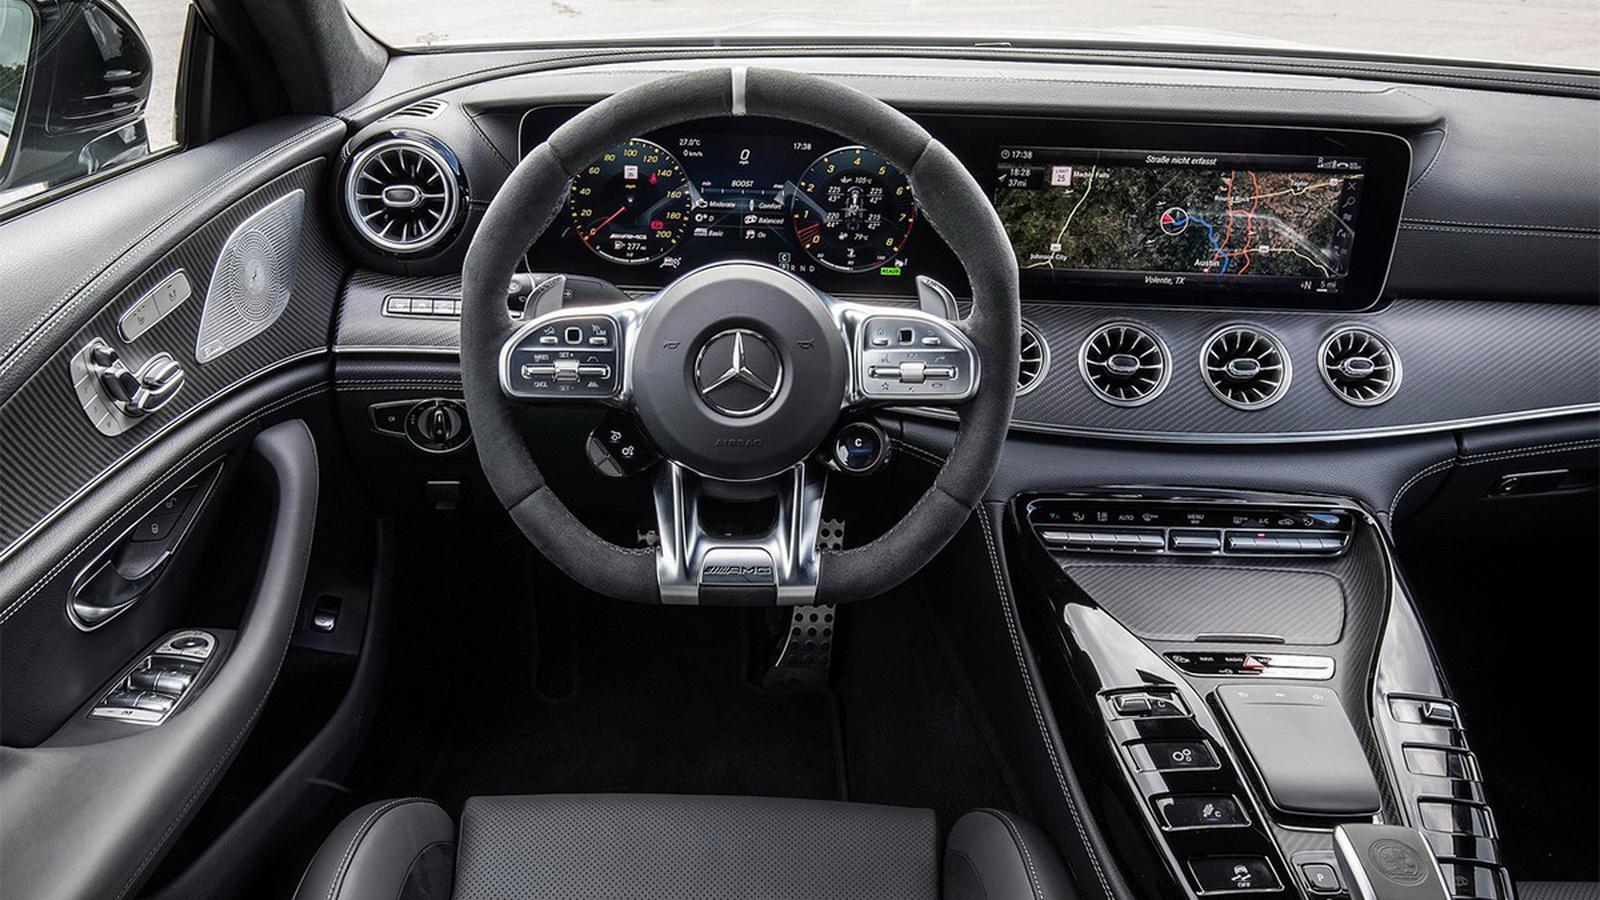 圖/2020 M-Benz AMG GT 4-Door Coupe 53 4MATIC+設計上導入「Driving Performance」品牌精神,打造出濃濃的科技氛圍。